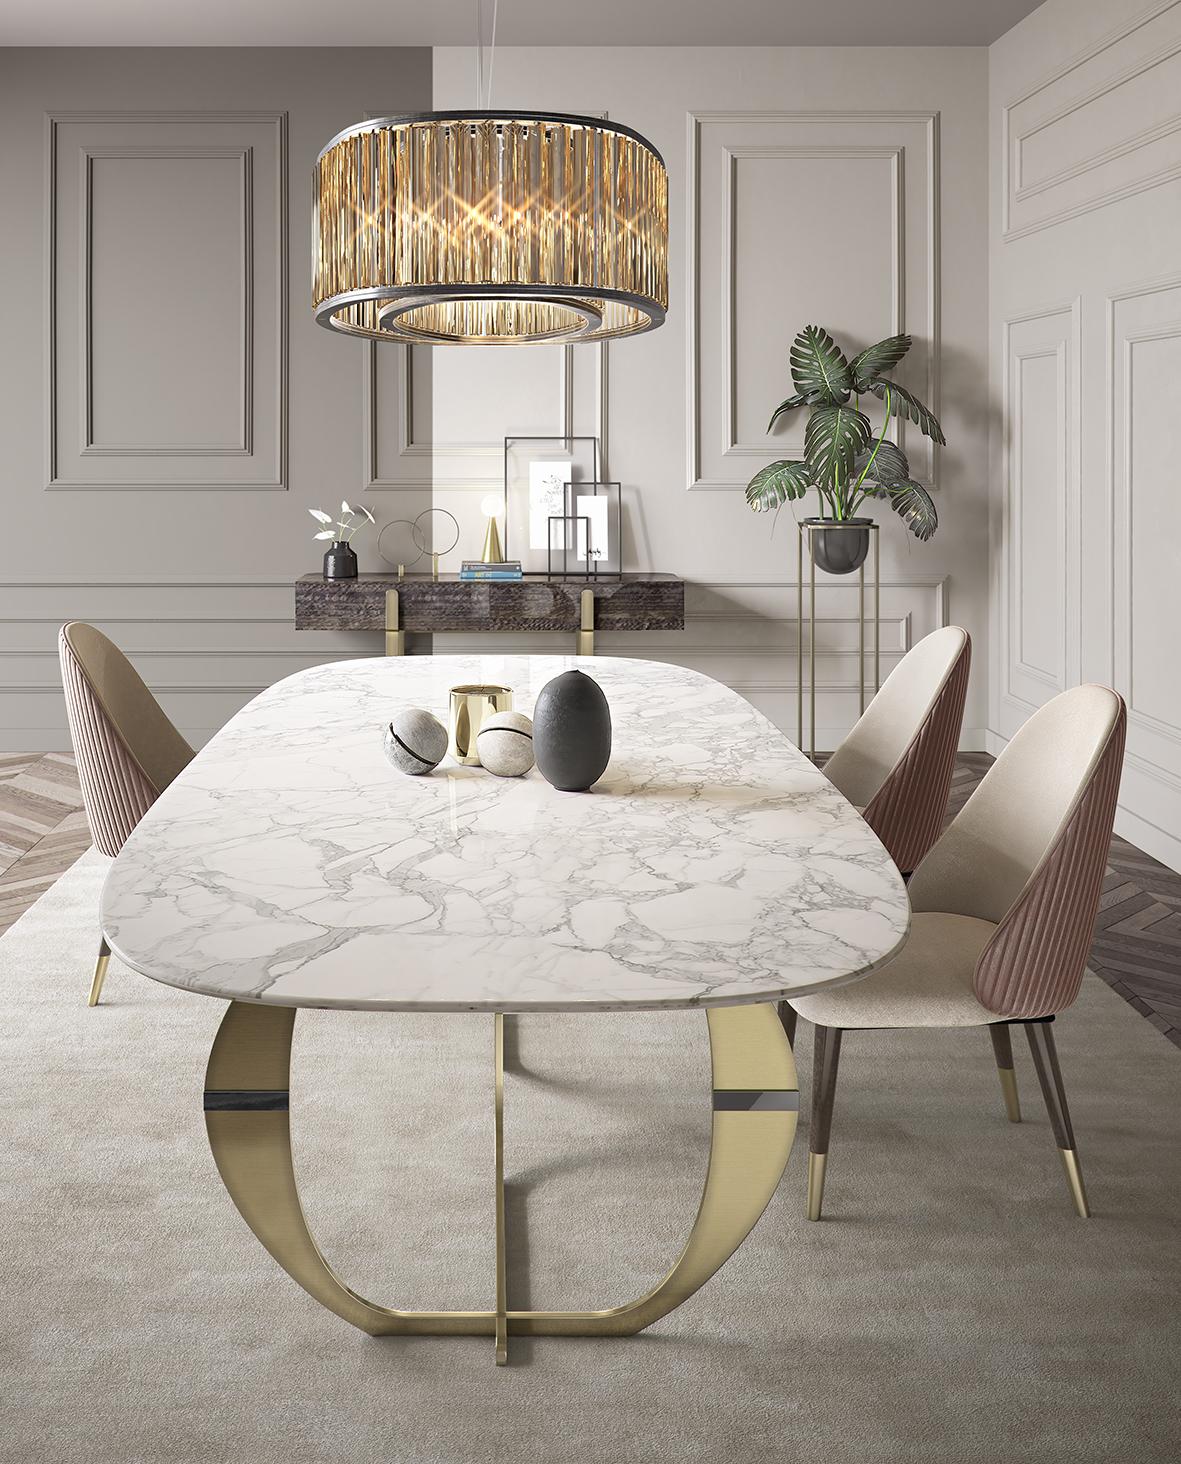 Juliettes Interiors marble dining table in bright luxury interior designer room